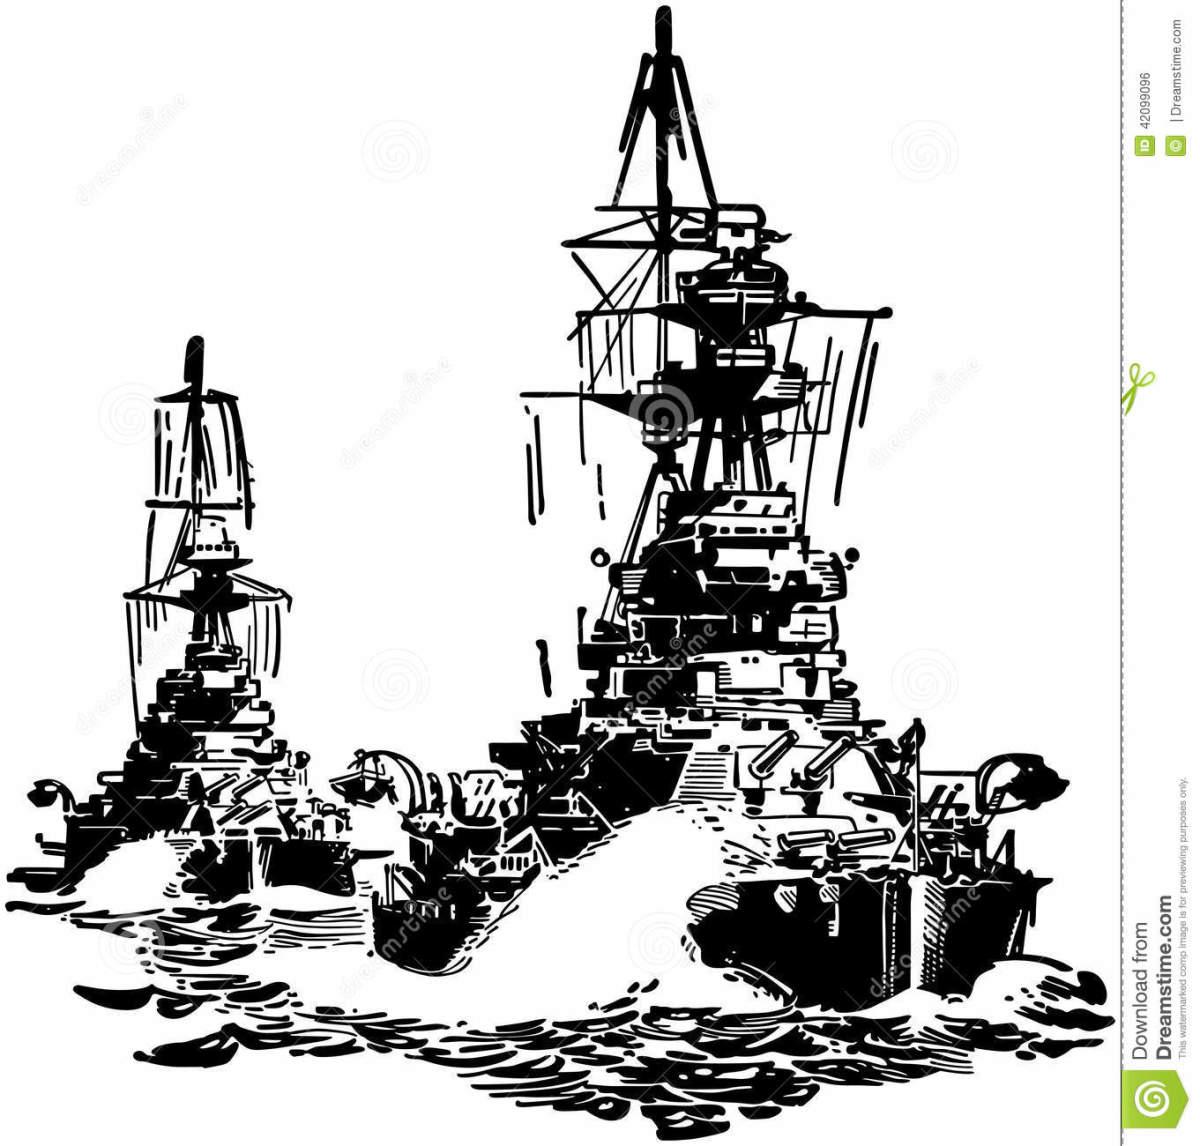 Battle of Jutland: Biggest ever Battle Involving Surface Ships(1916)